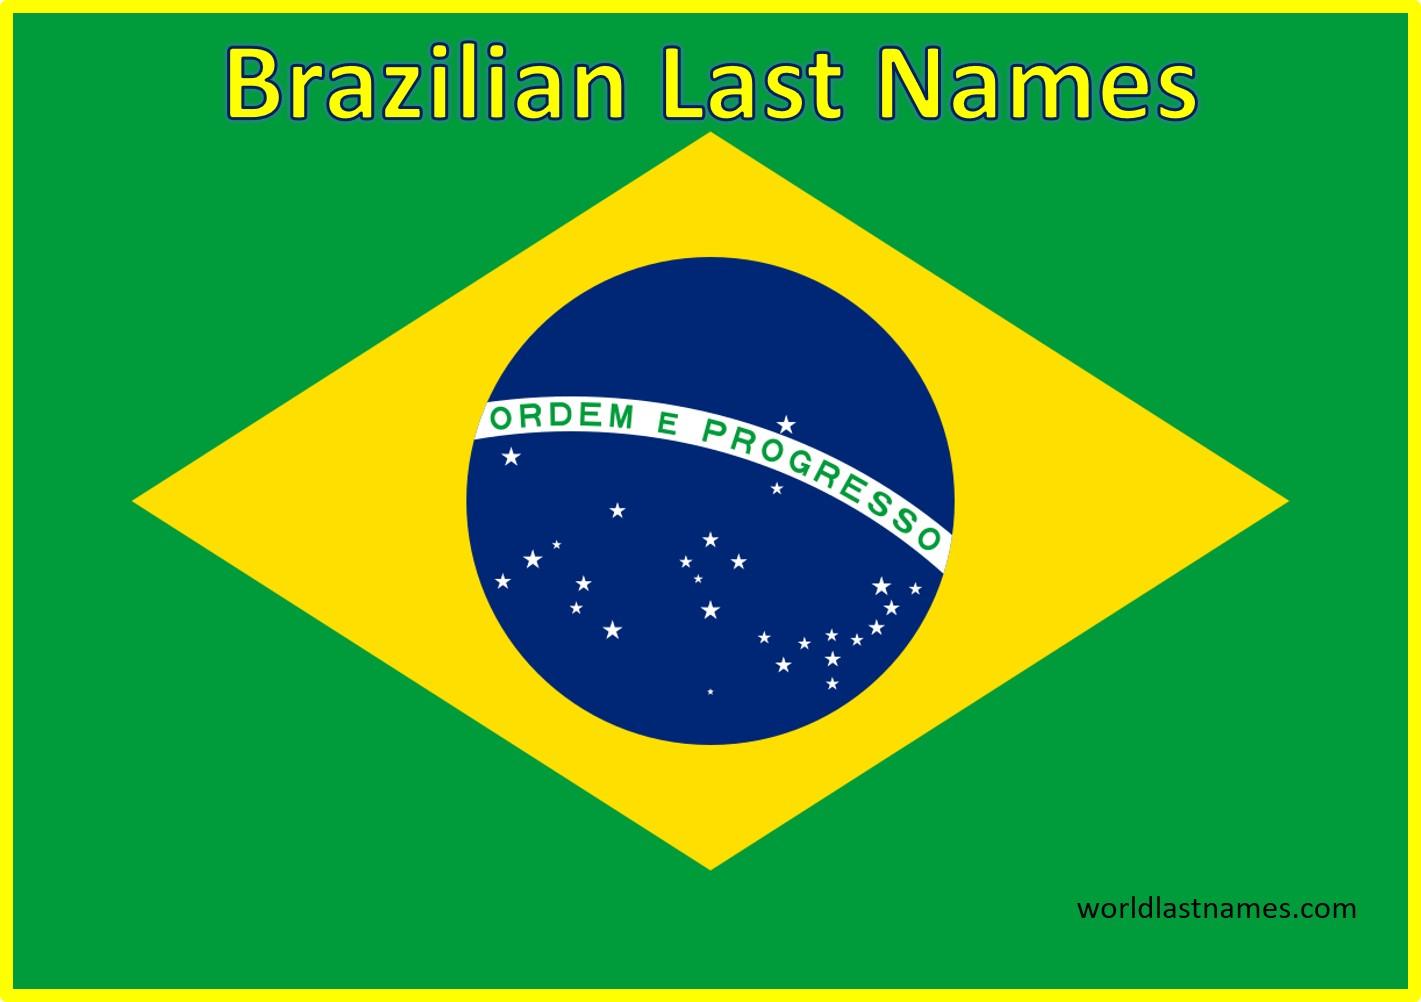 Brazilian Last Names